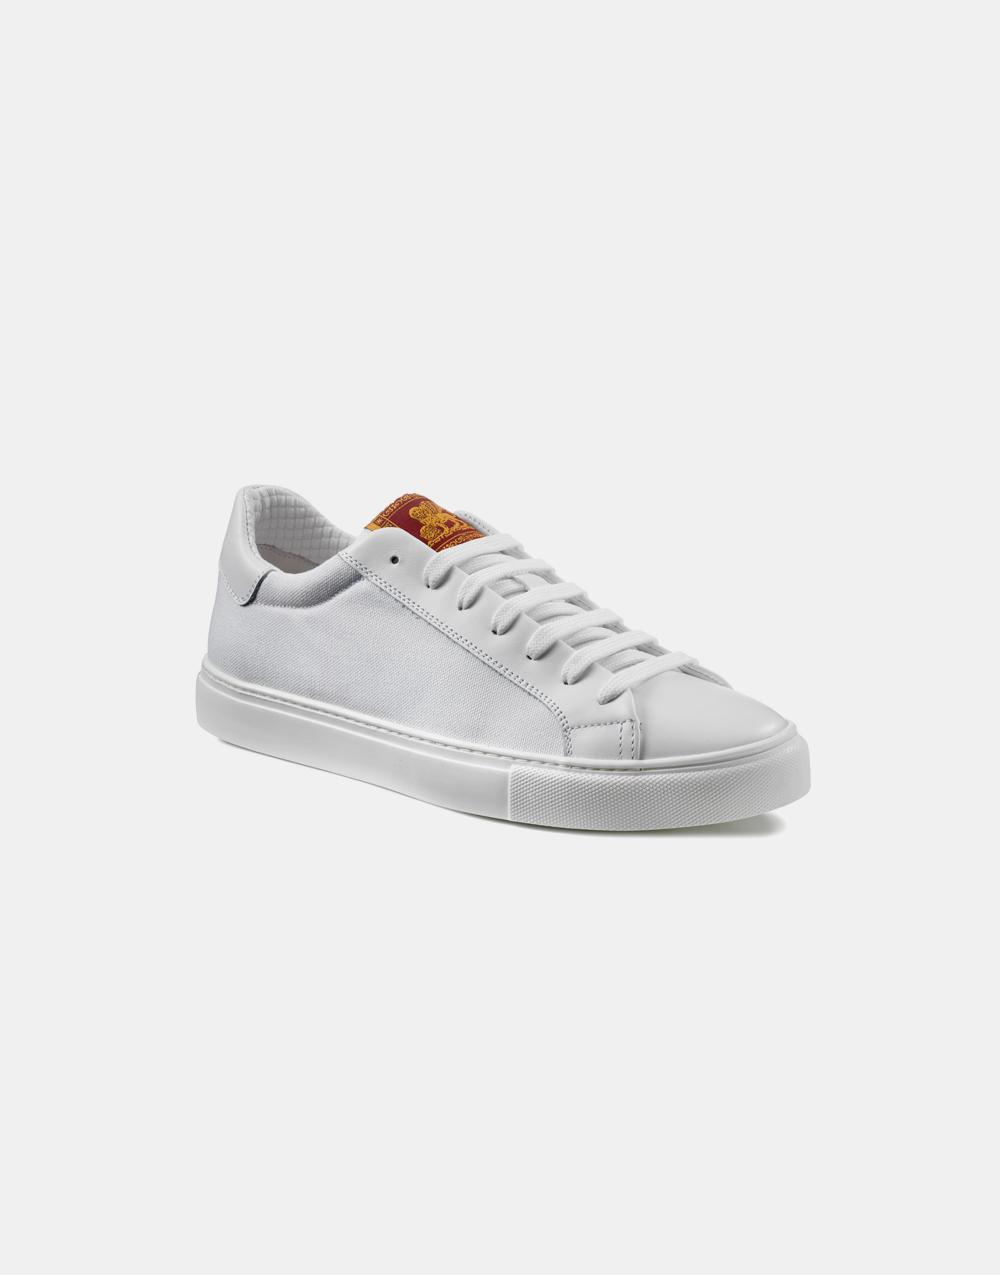 sneakers-veneto-doc-bianca-tela-bassa